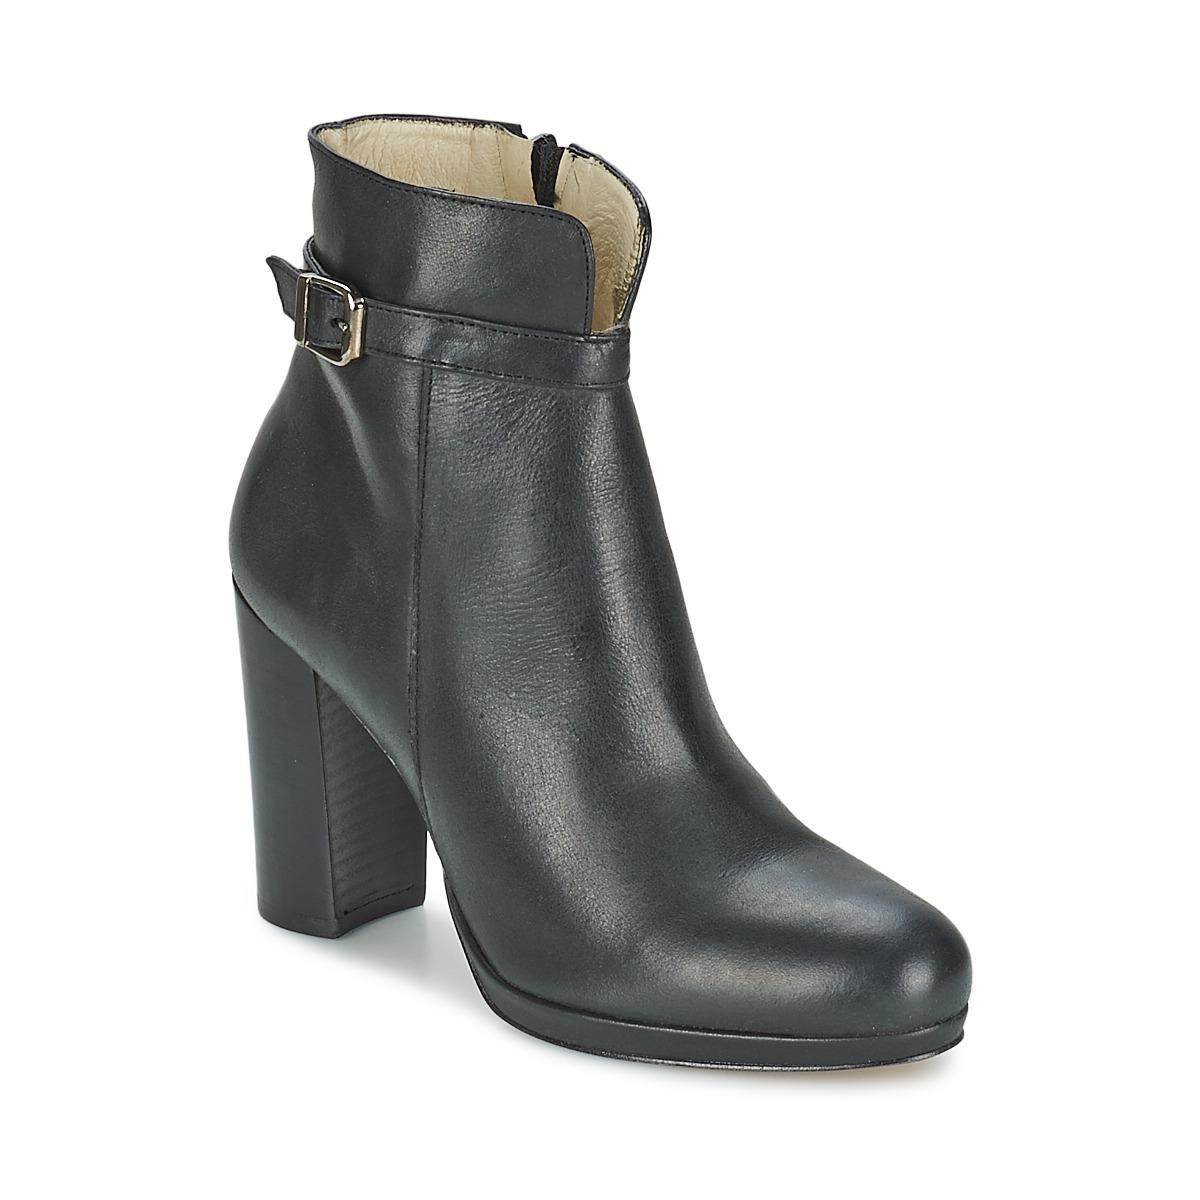 Betty London GRAZI Schwarz - Kostenloser Versand bei Spartoode ! - Schuhe Low Boots Damen 62,50 €